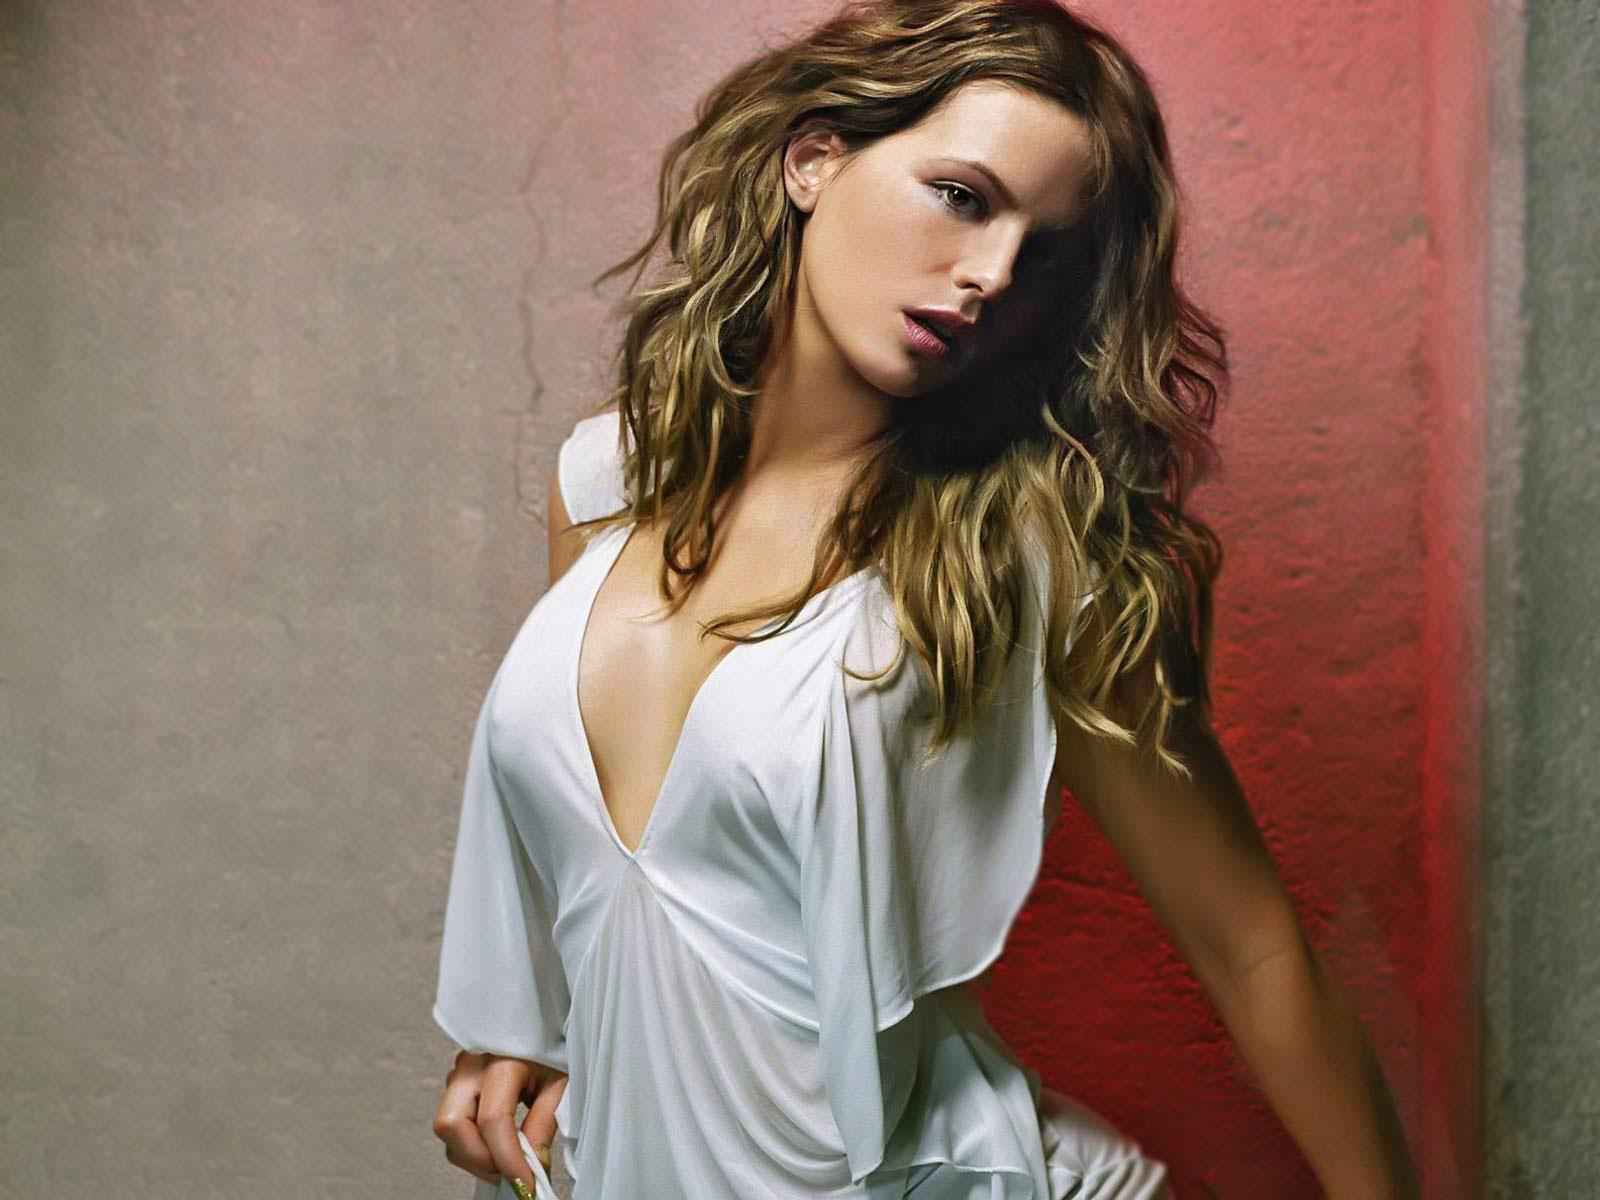 hollywoodhotspot: Kate backinsale hot wallpapers